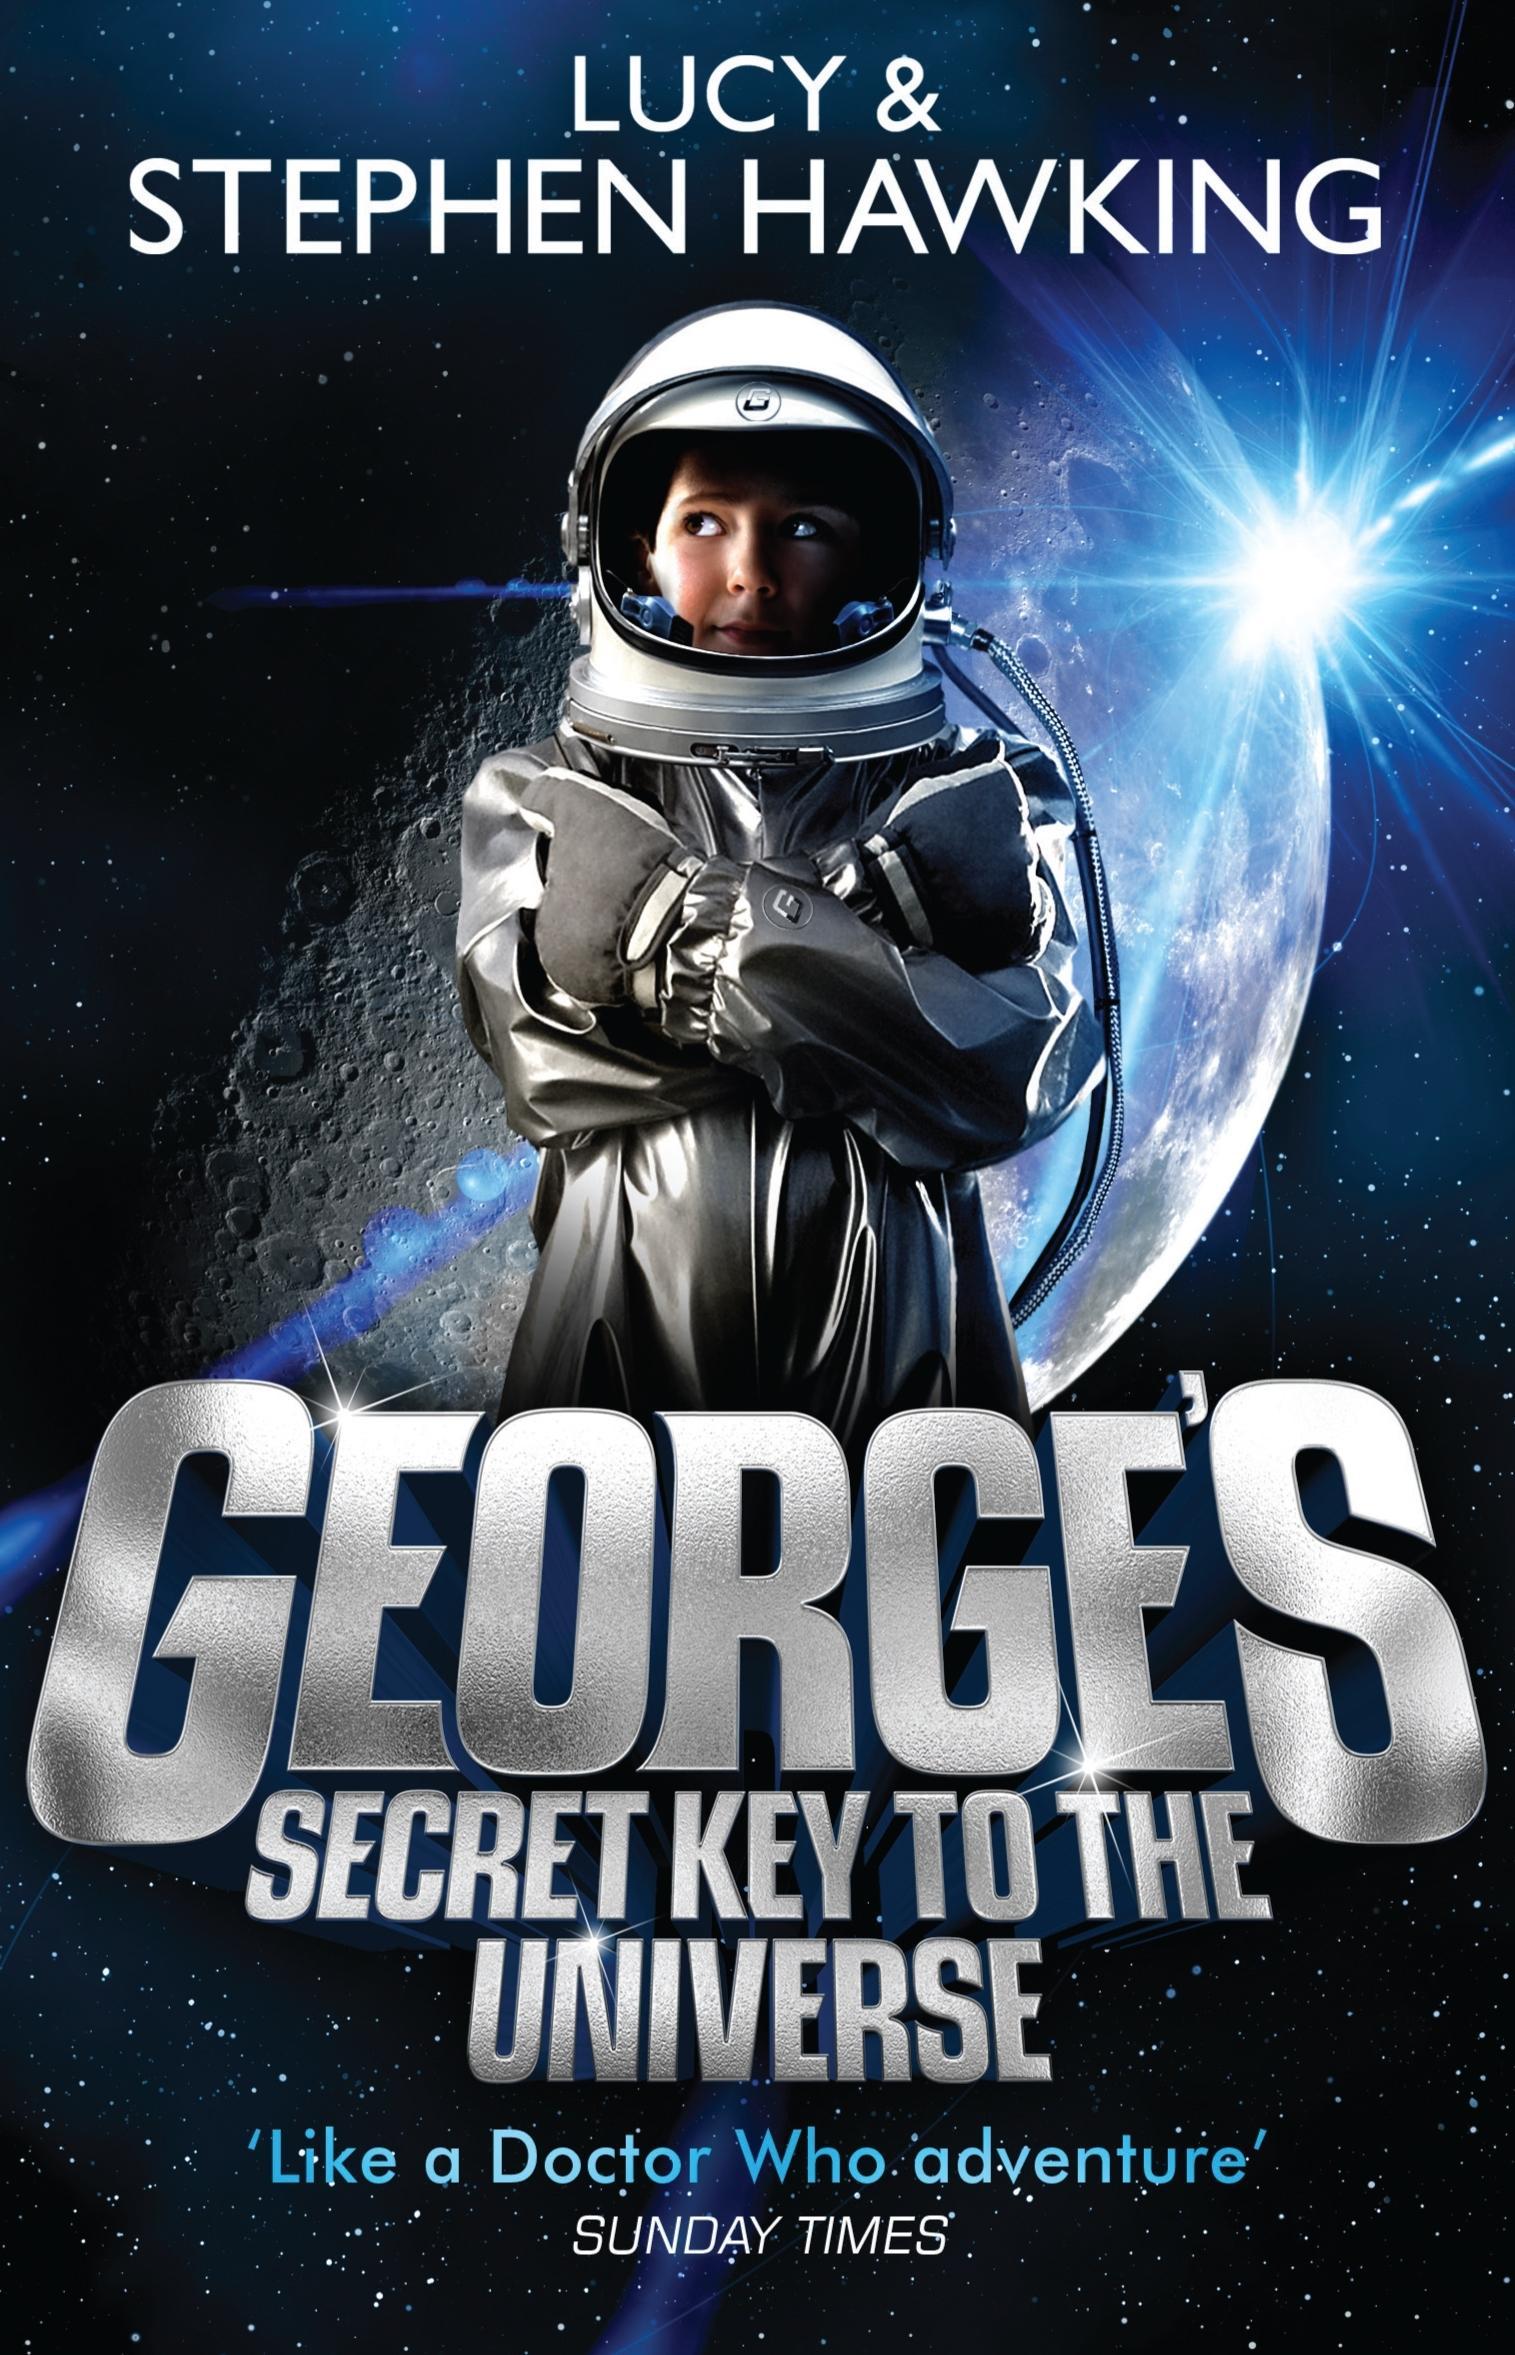 George's Secret Key totheUniverse